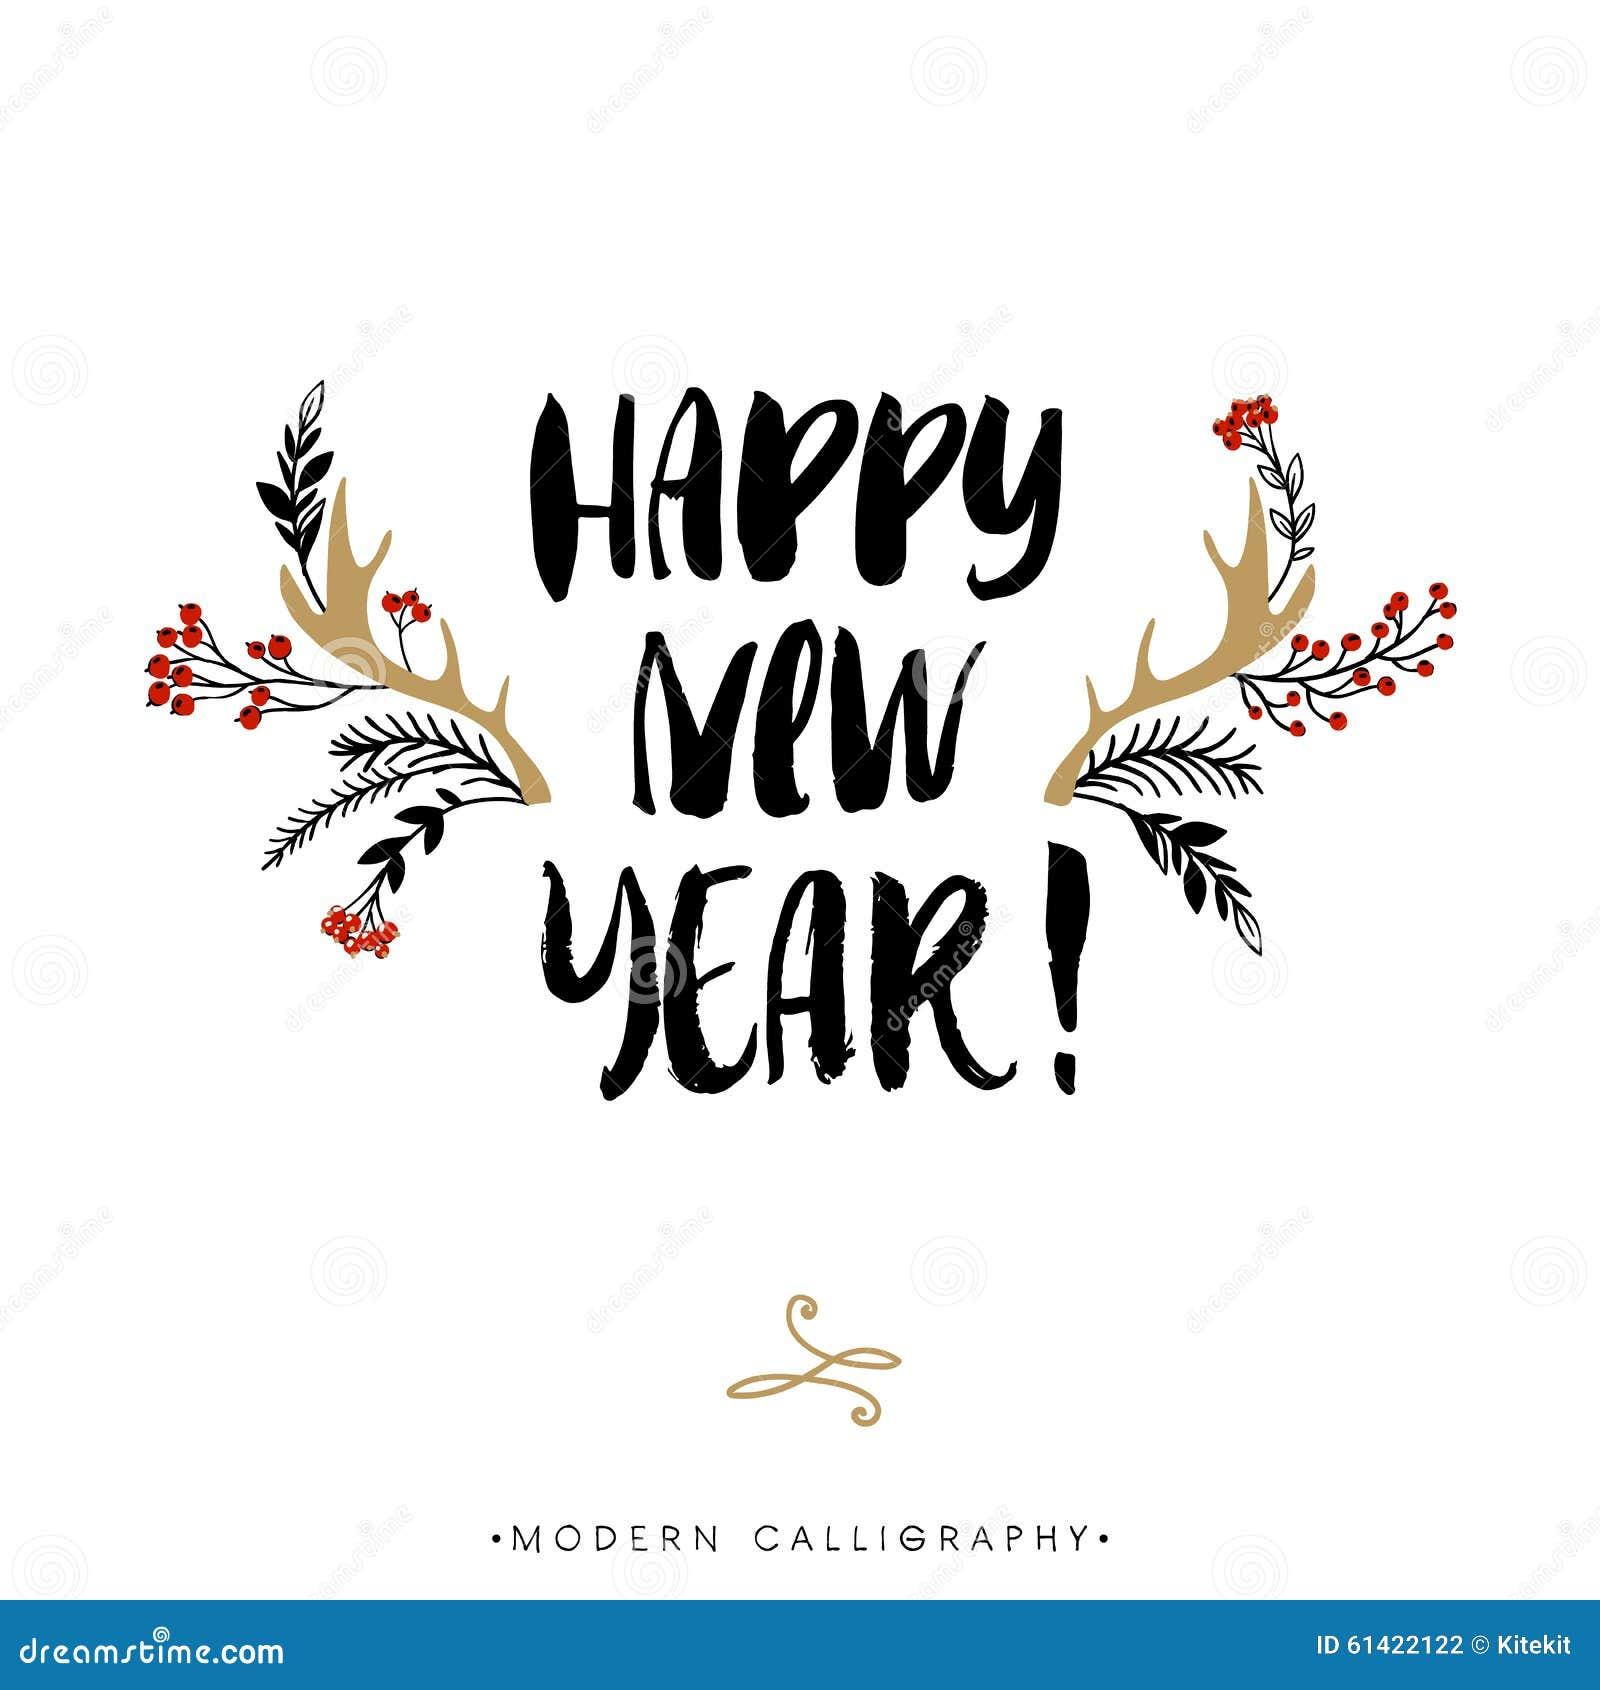 Happy new year christmas calligraphy stock illustration